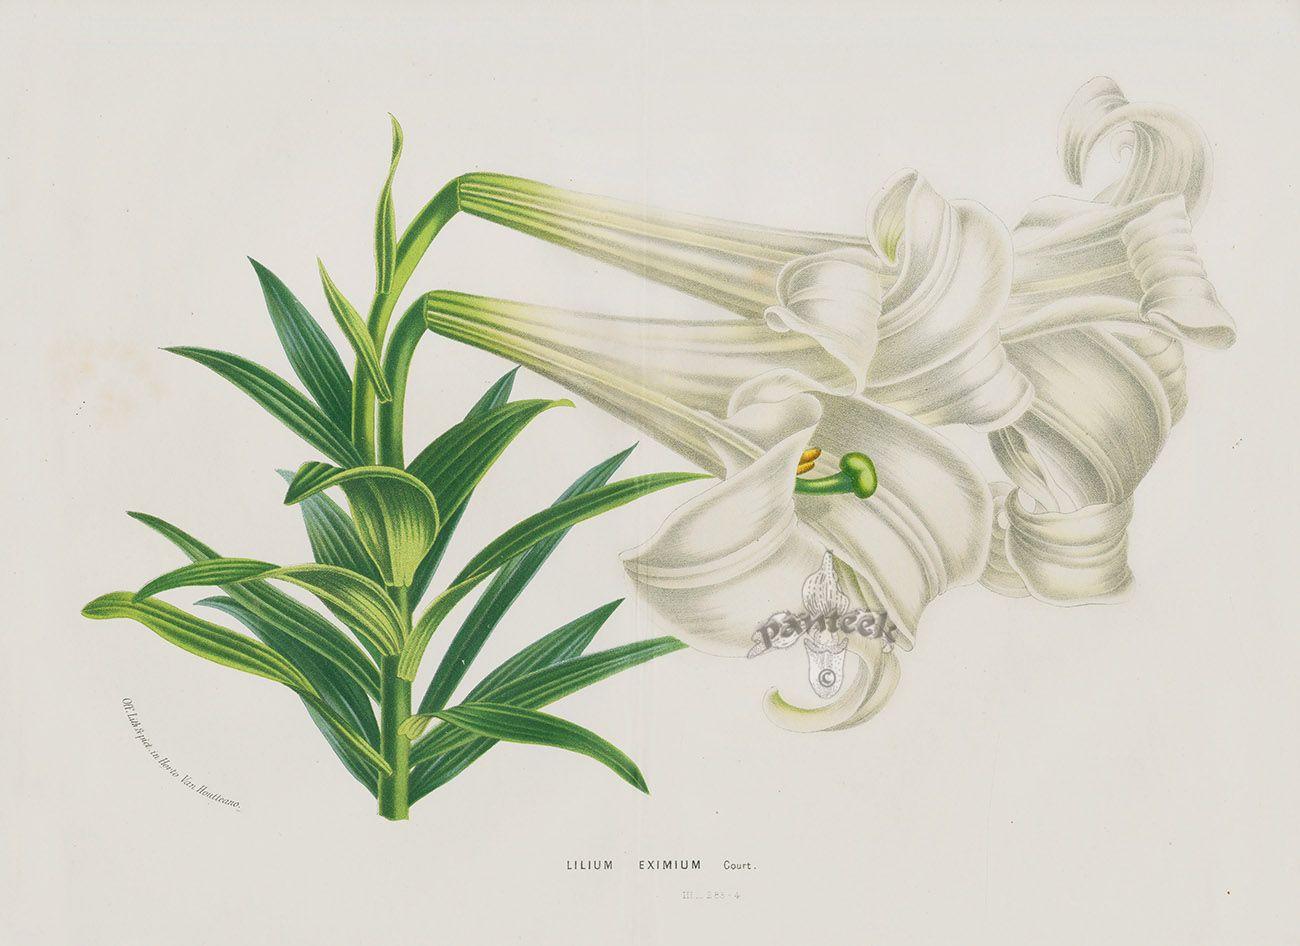 Lilium Eximium from Antique Flower Prints of Clematis, Gloxinia, Peony, Hydrangea